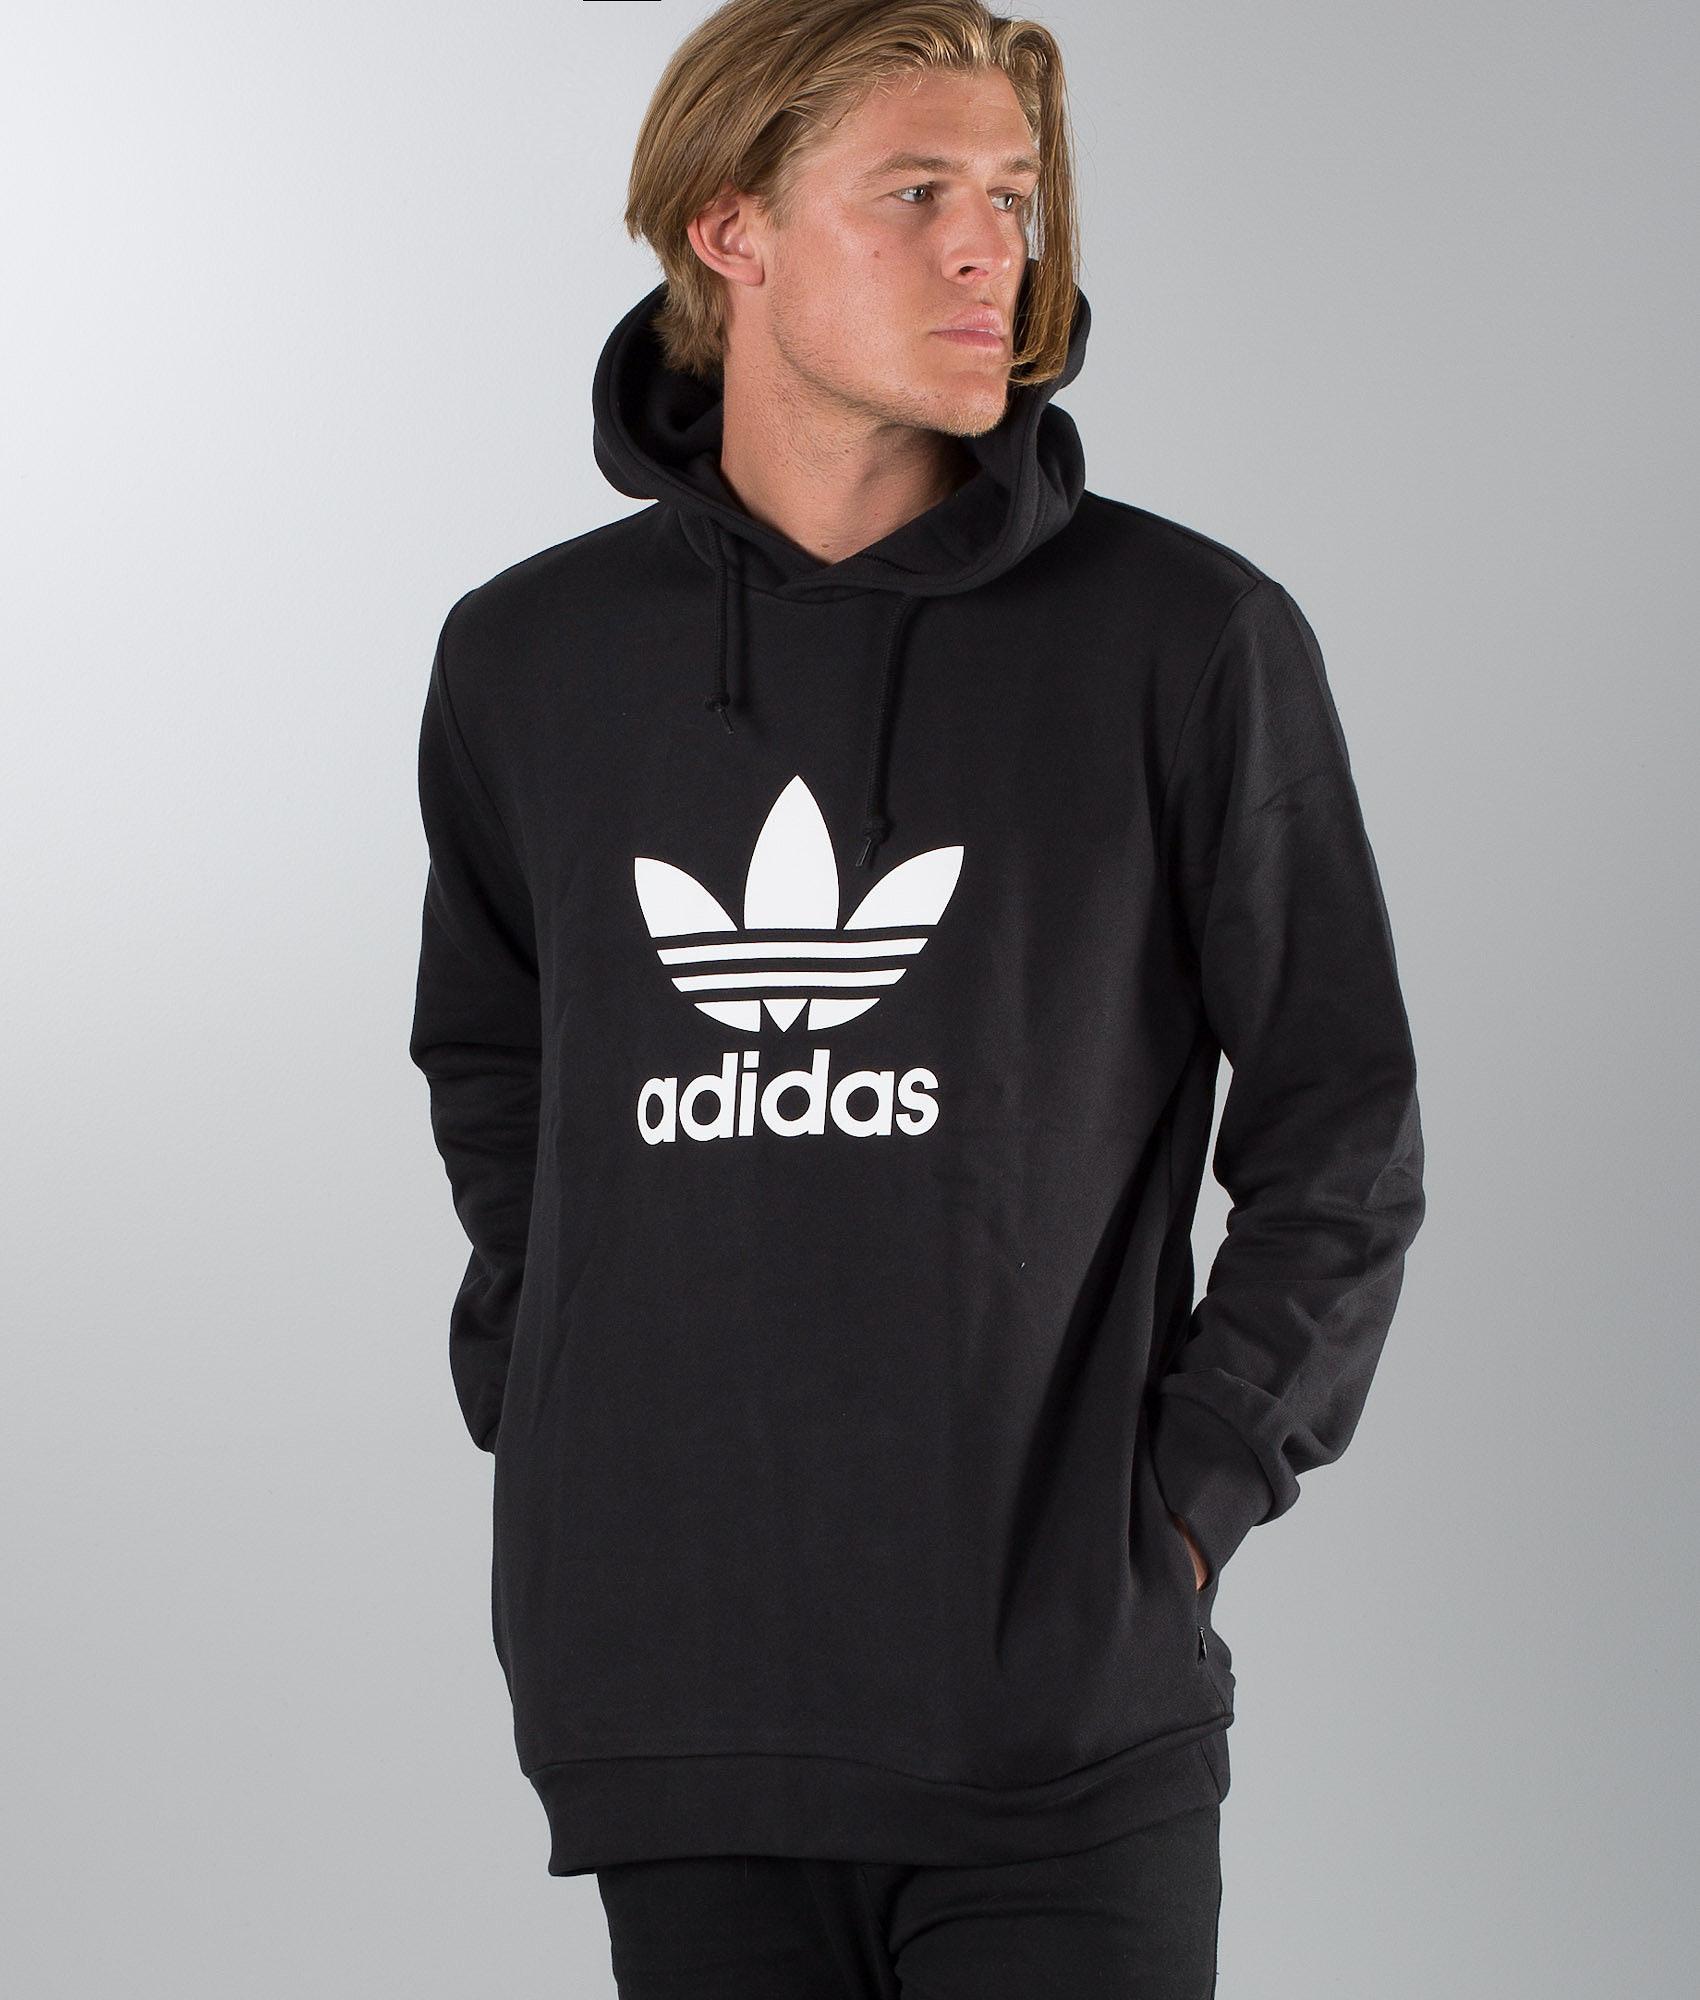 530842dccb2f Adidas Originals Trefoil Hoodie Mist Sun - Ridestore.com